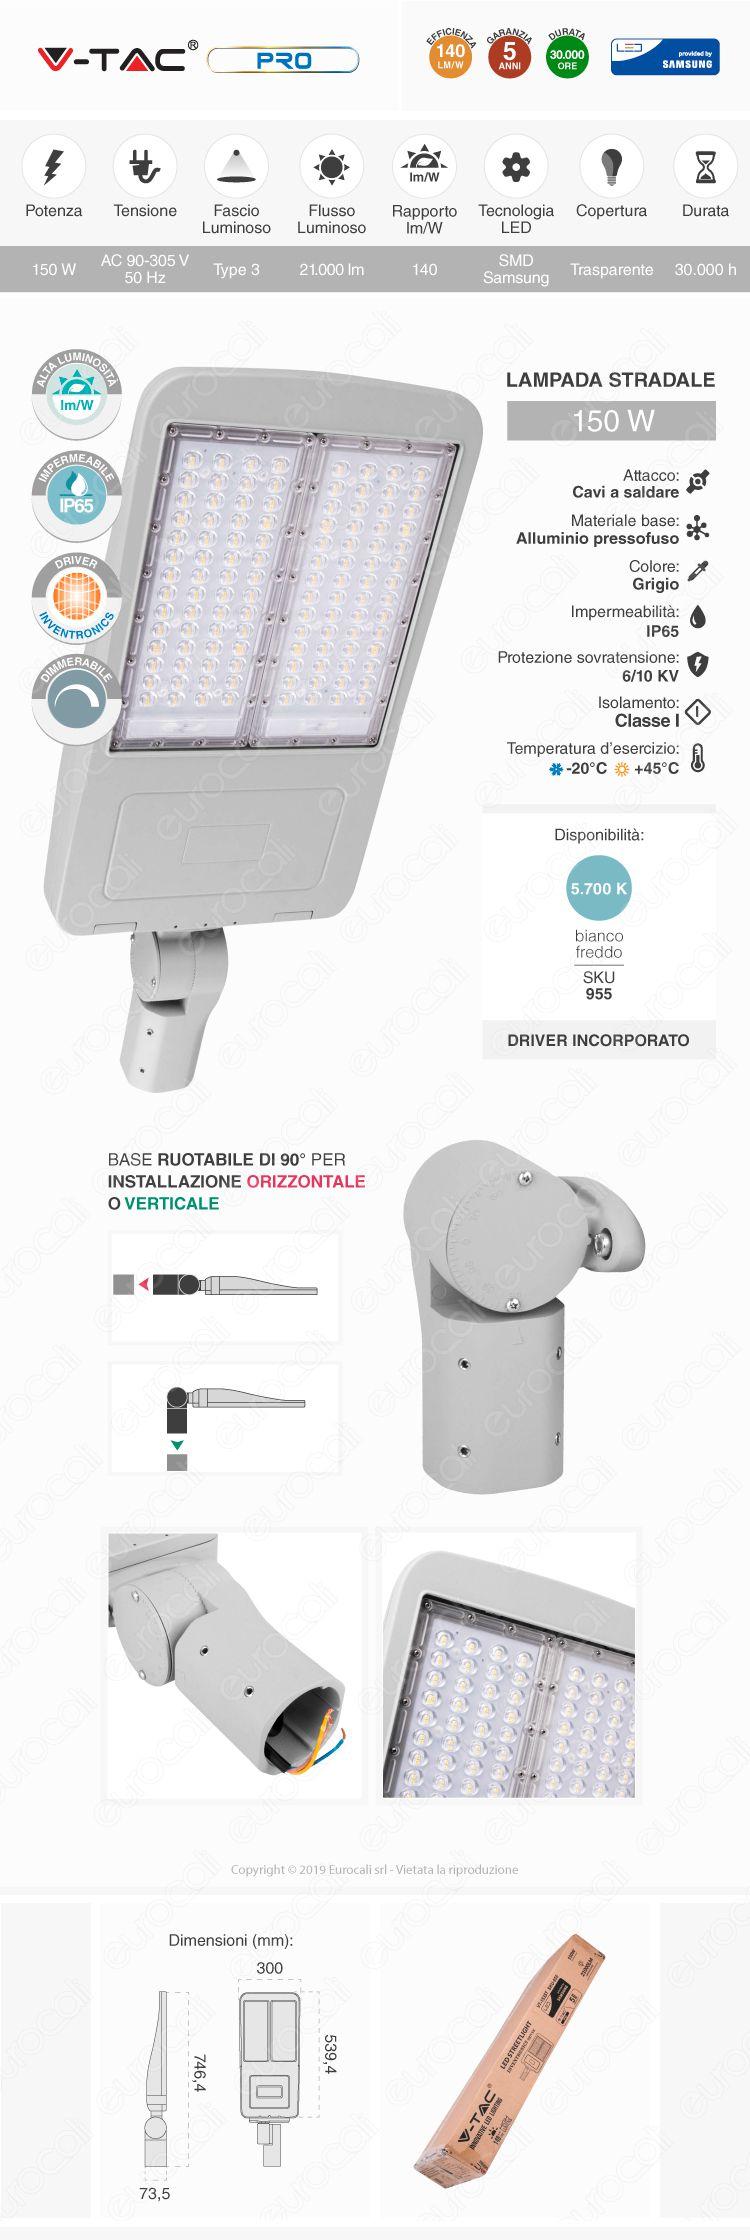 V-Tac PRO VT-153ST Lampada Stradale LED 150W Lampione SMD Chip Samsung Fascio Luminoso Type 3